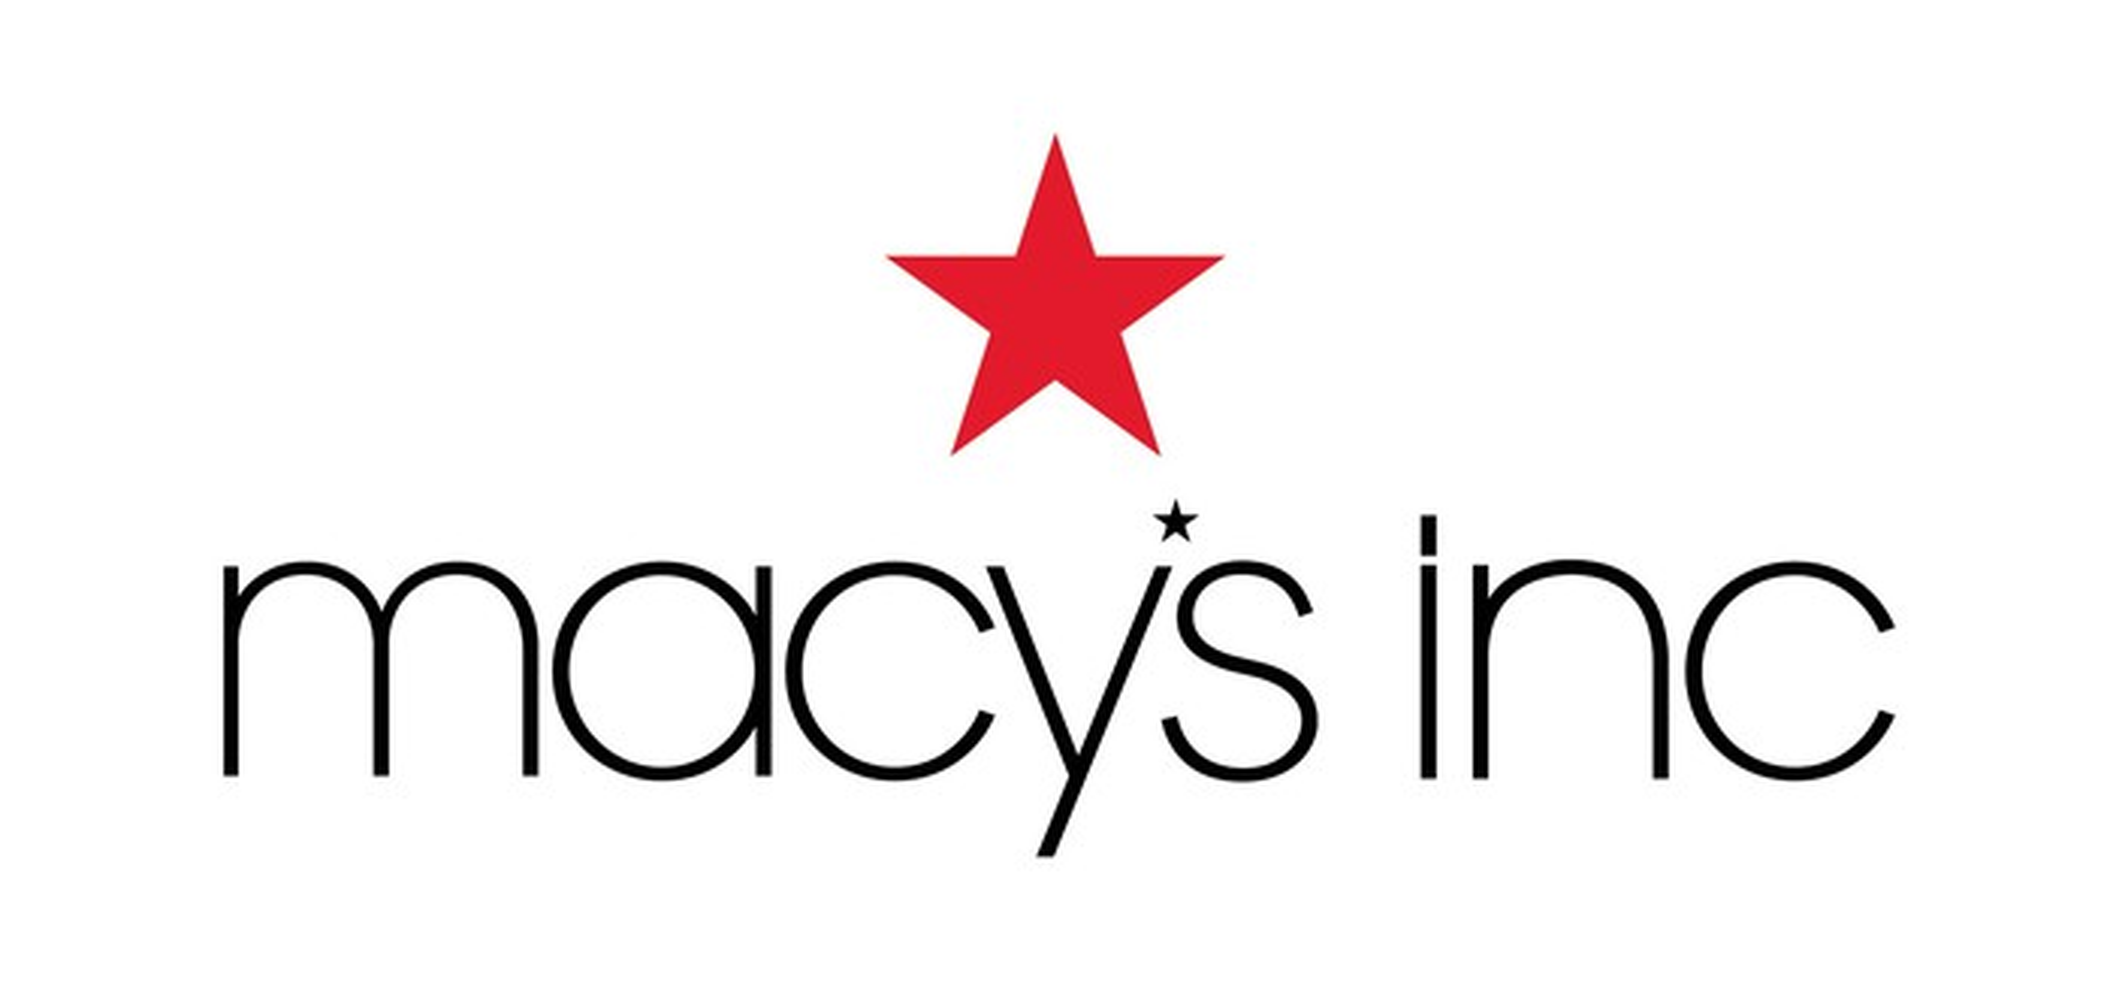 The Macy's corporate logo